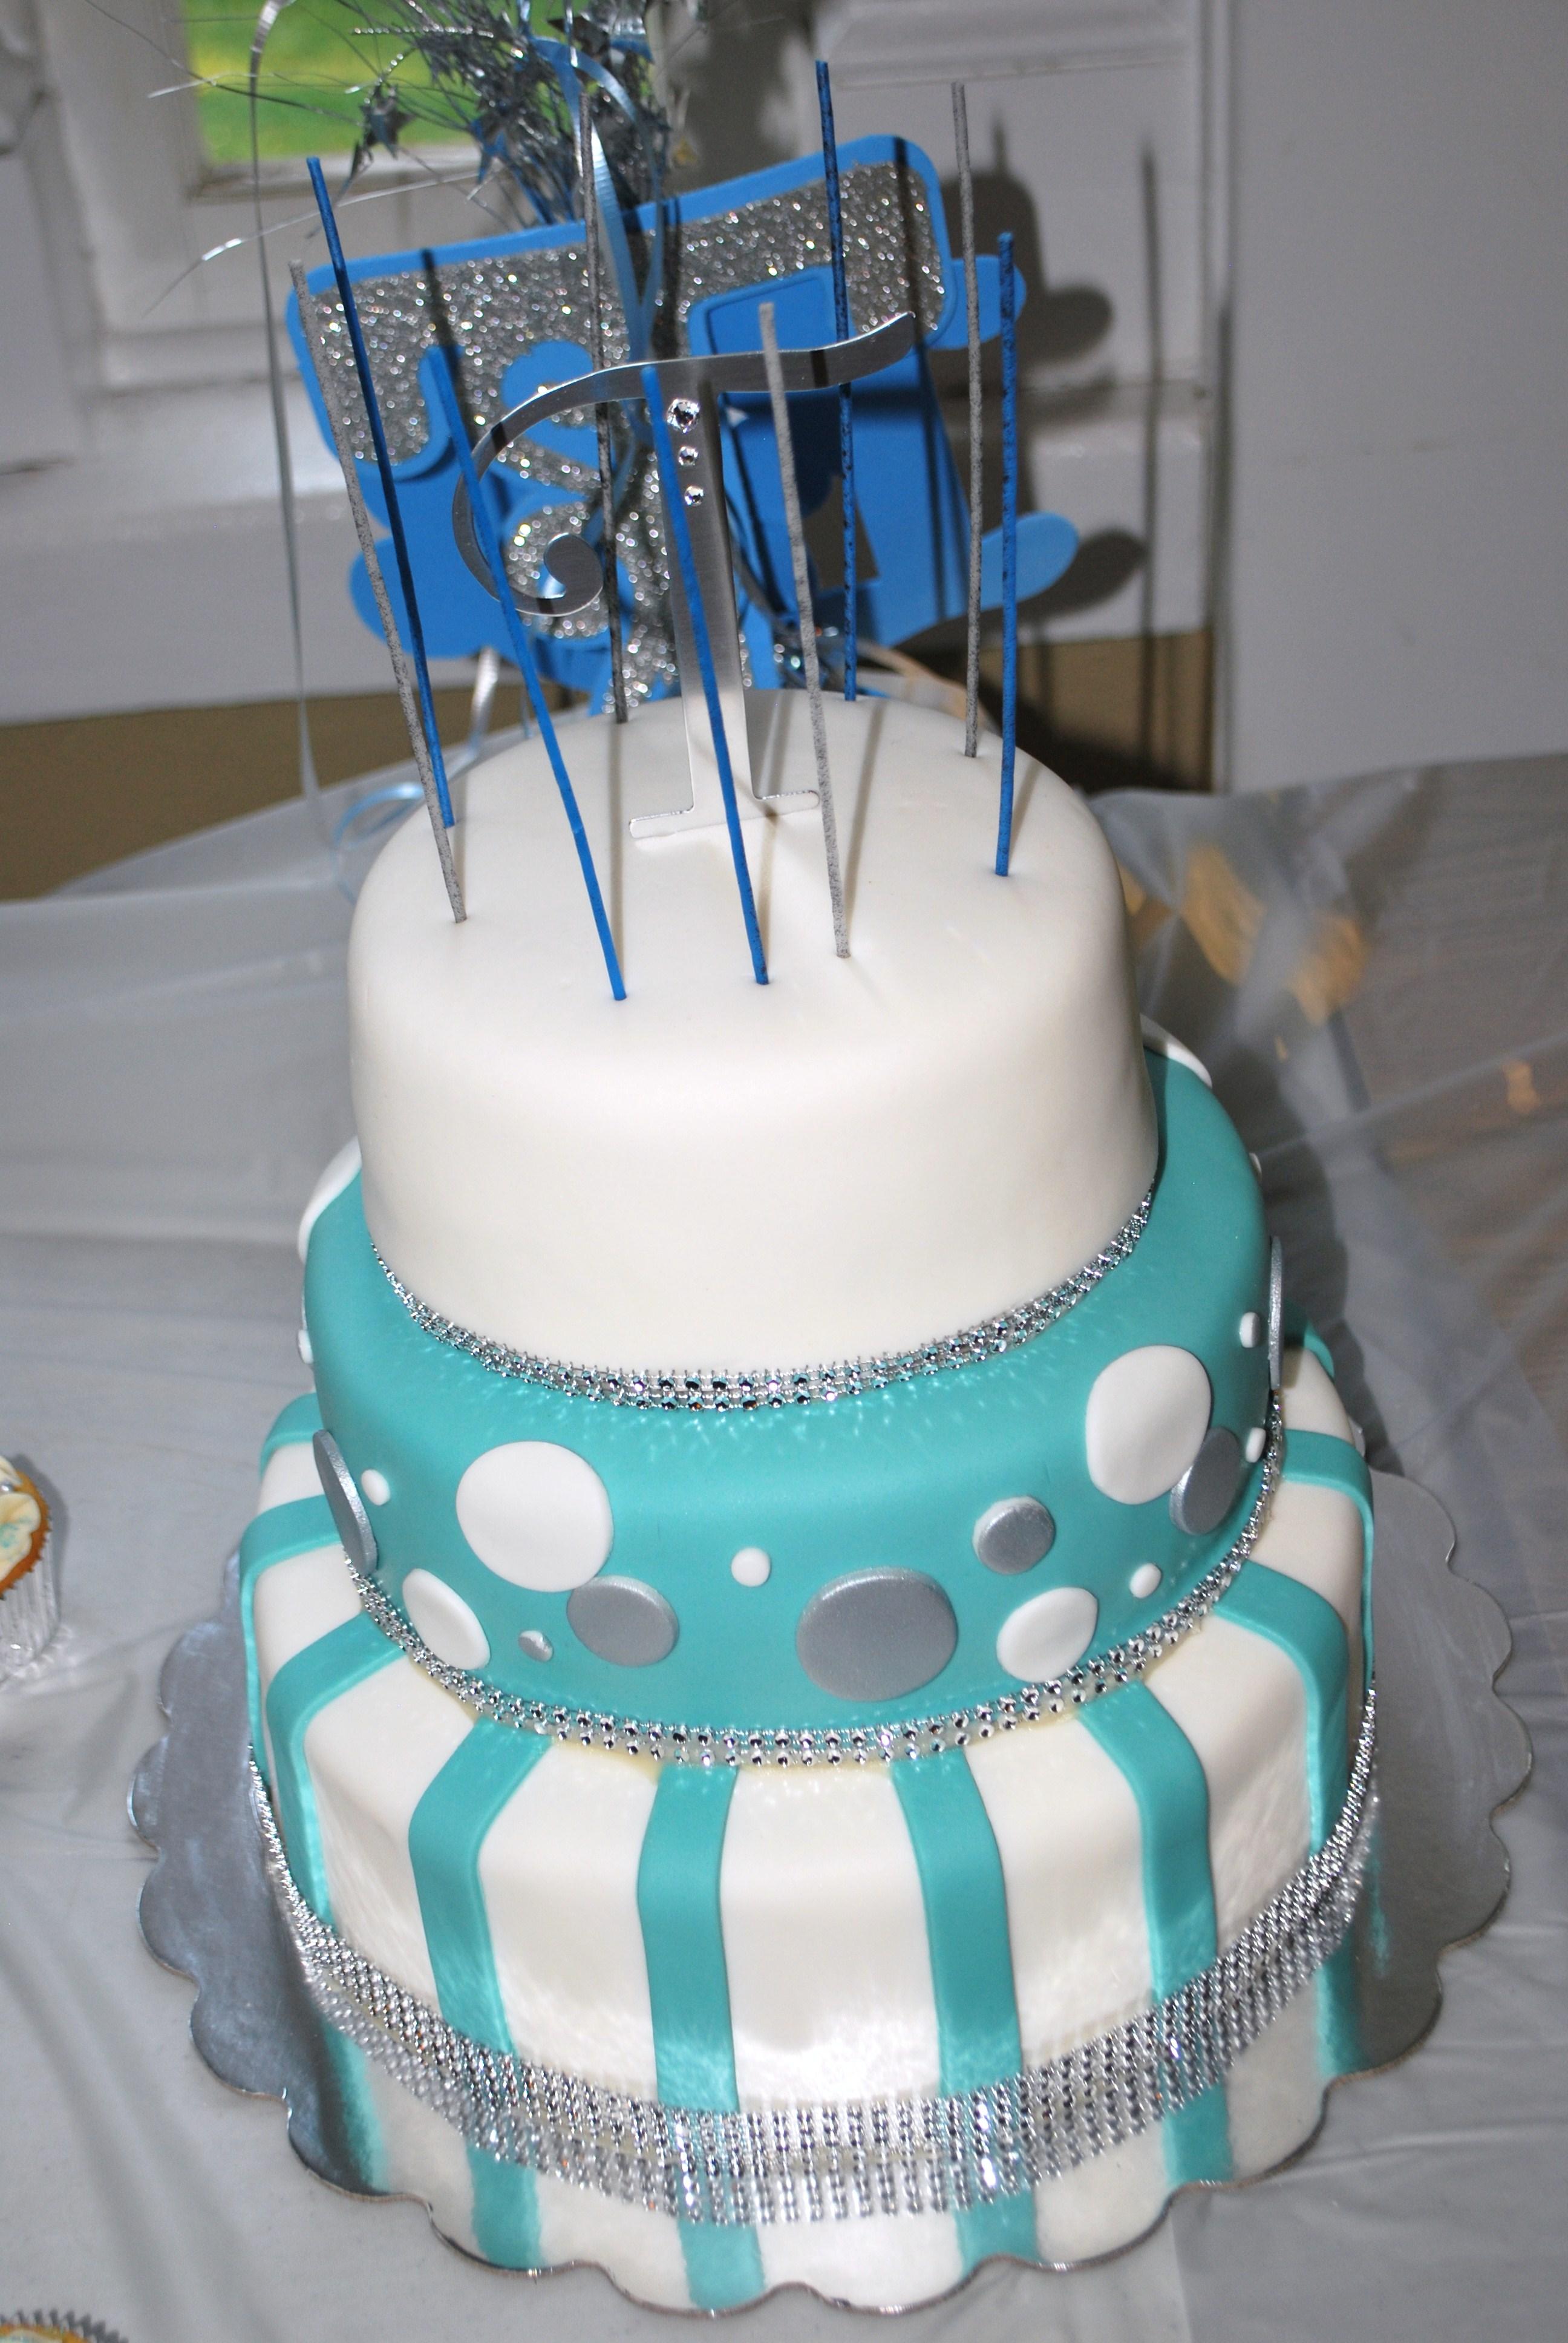 Happy 18th Birthday!